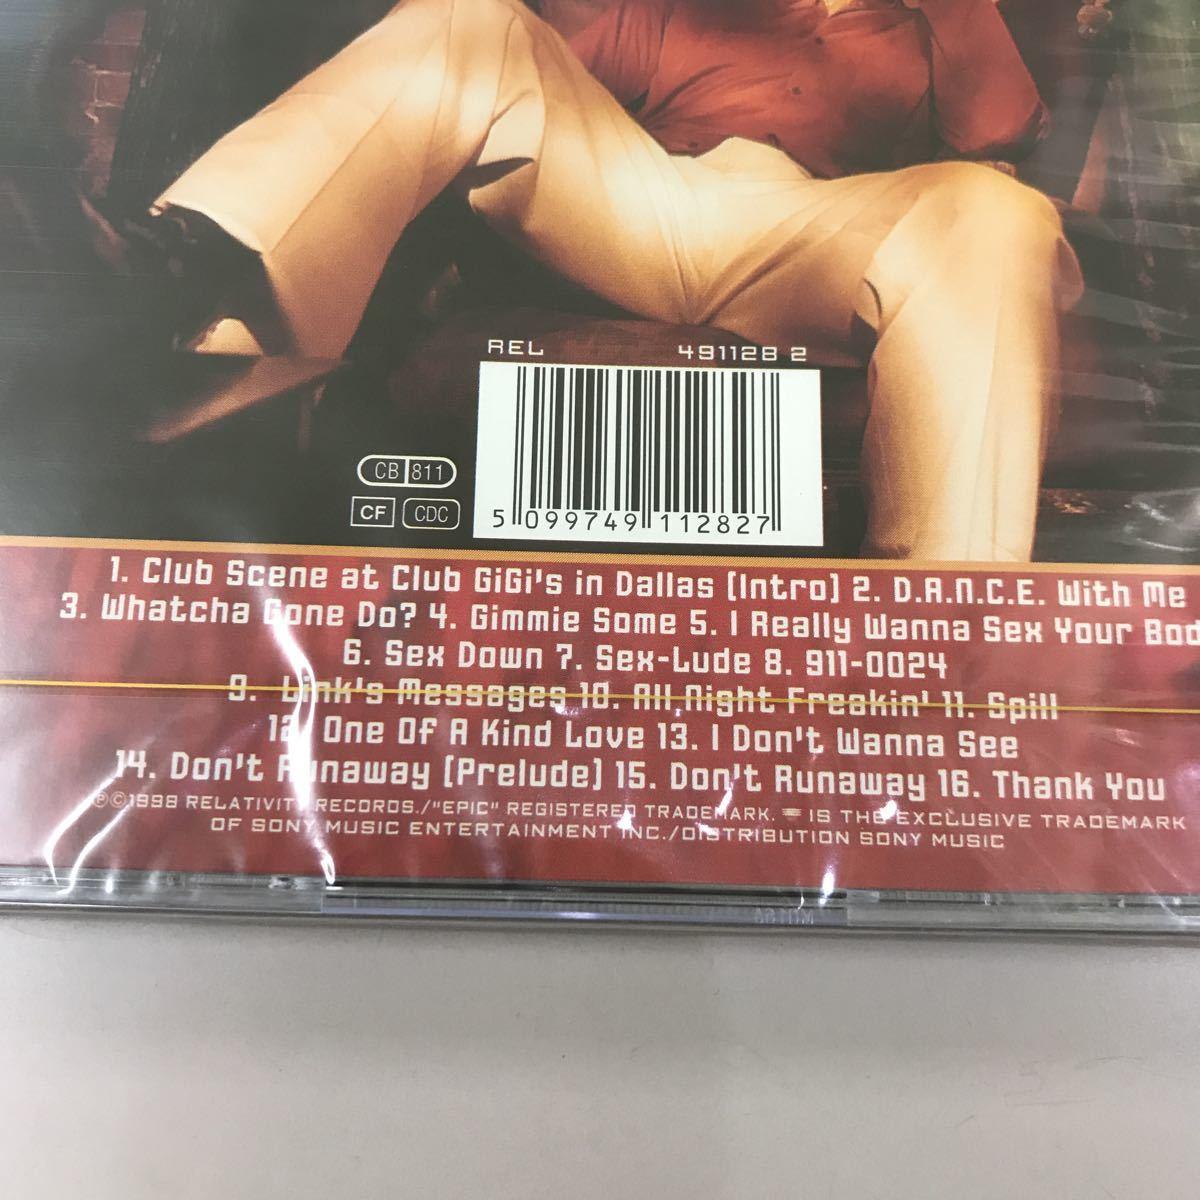 CD 輸入盤未開封【洋楽】長期保存品 LINK SEX DOWN